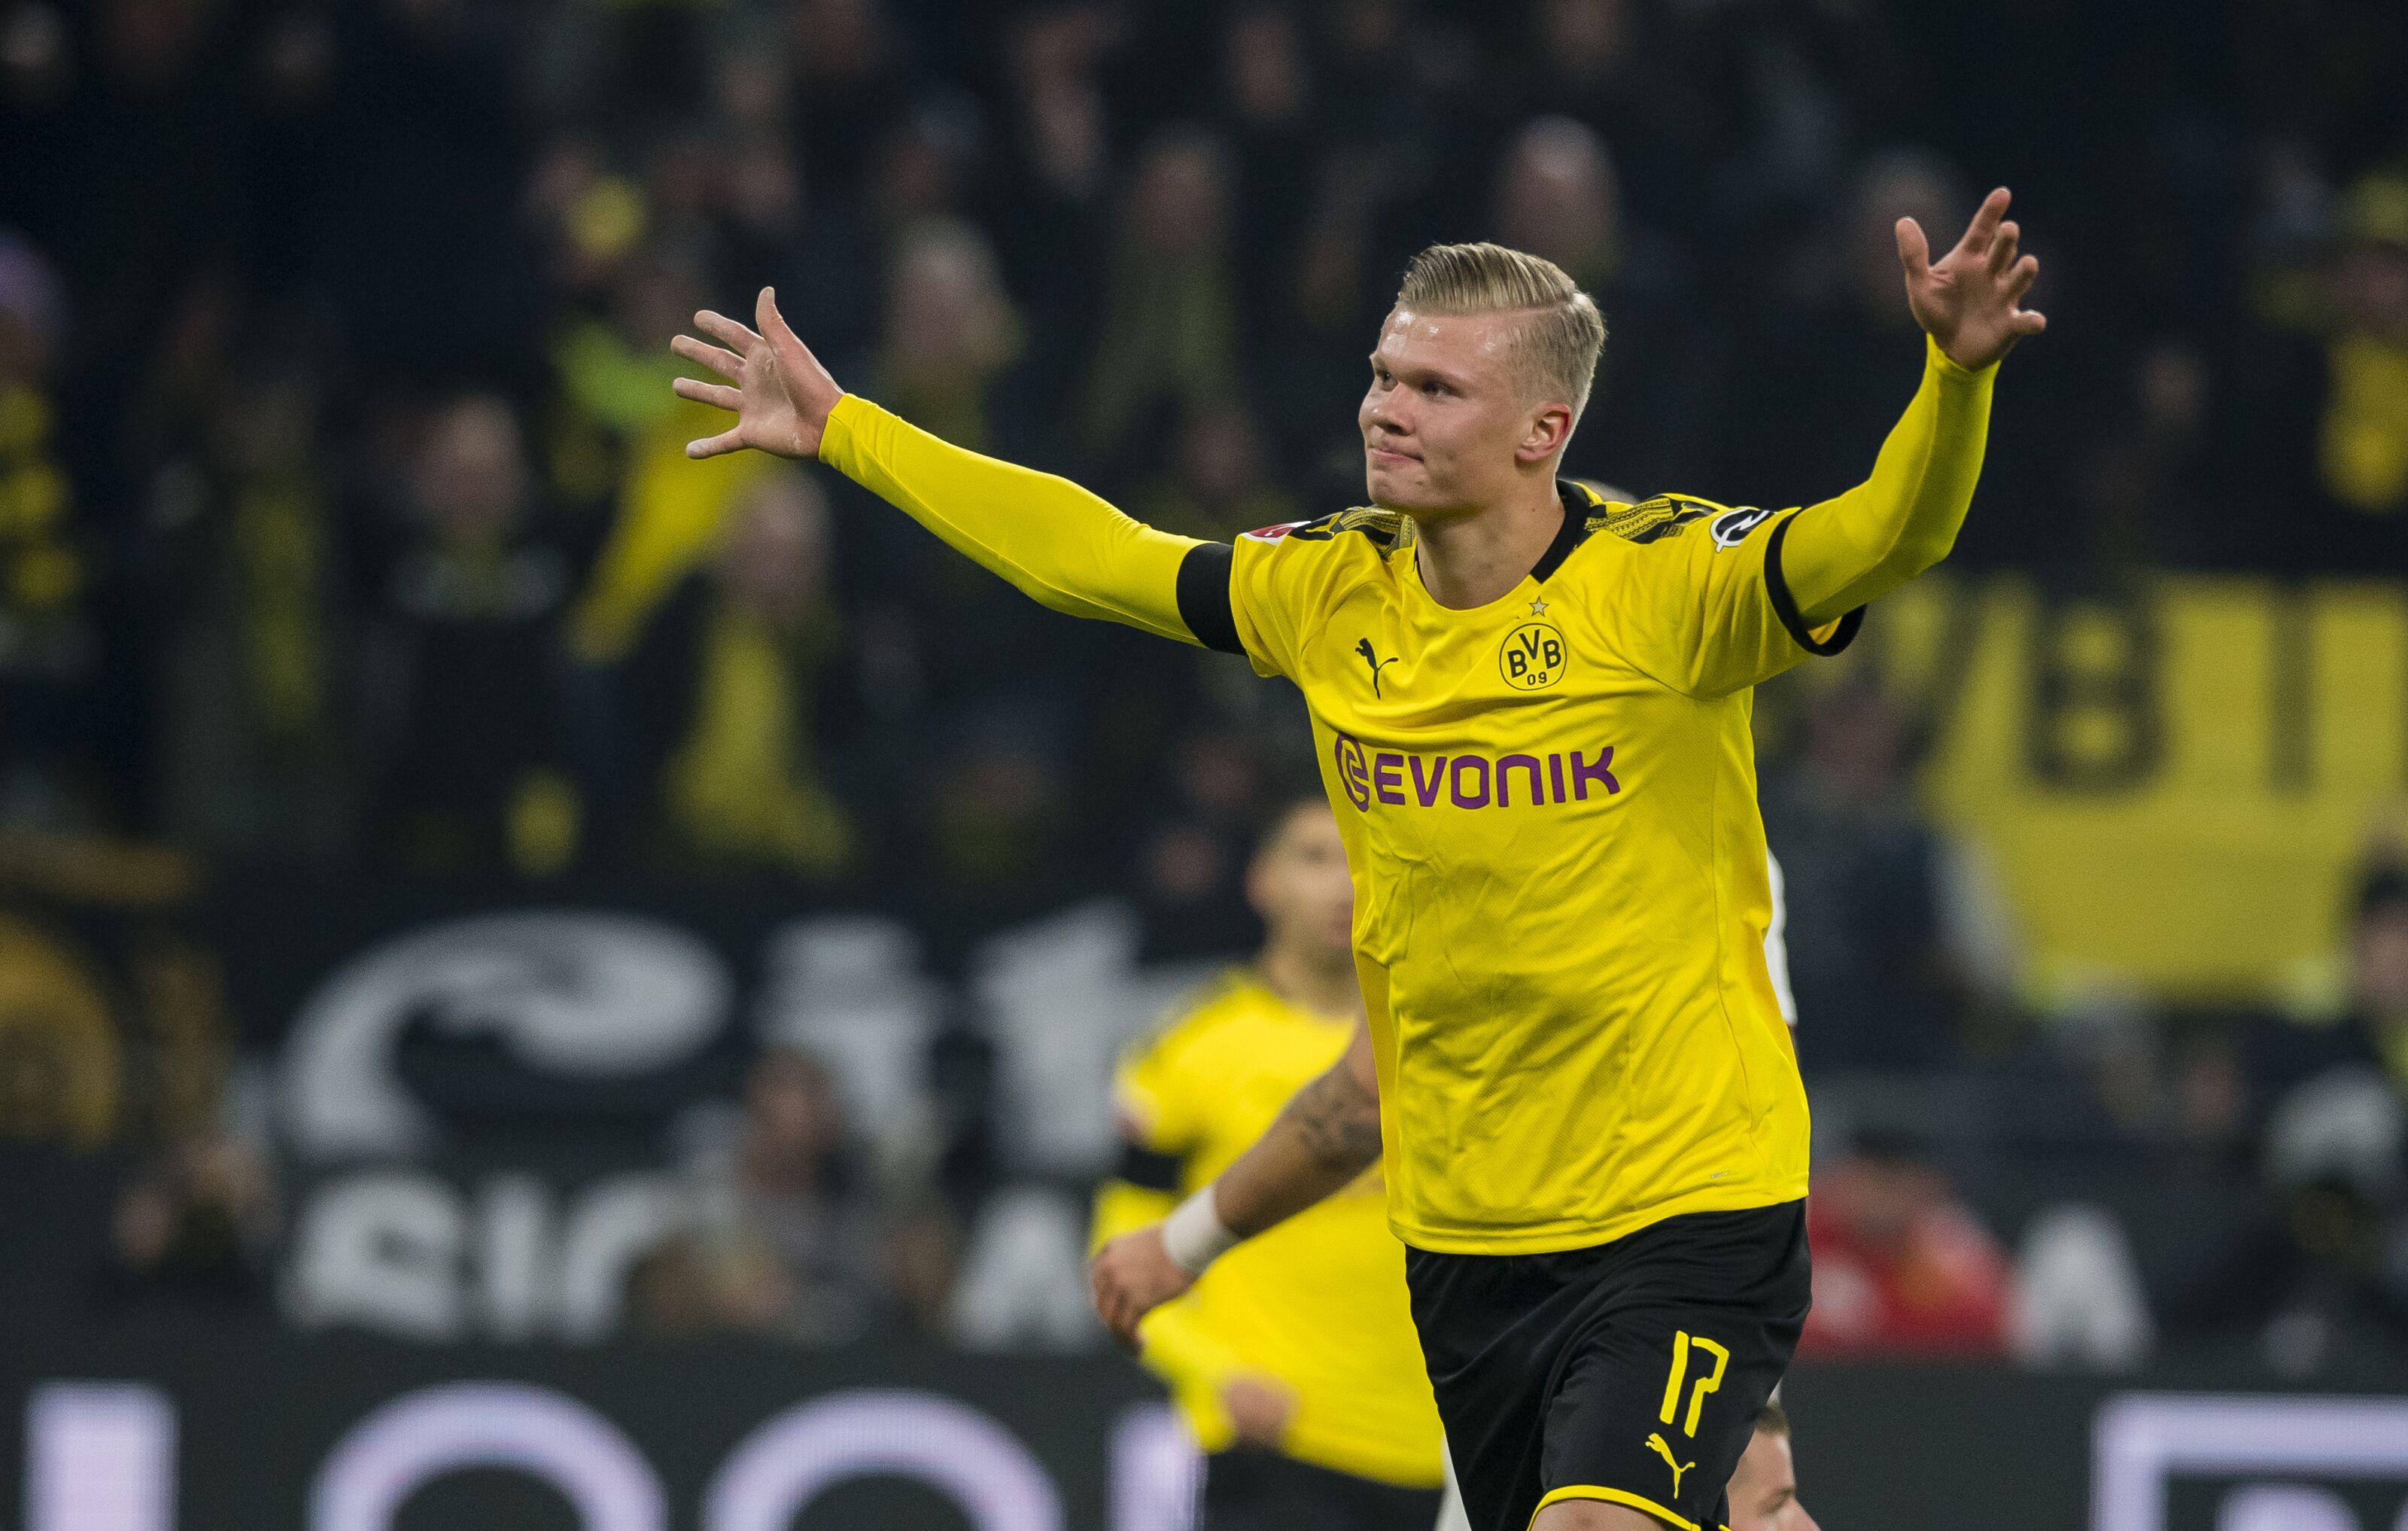 Borussia Dortmund teammates rave about free-scoring Erling Haaland